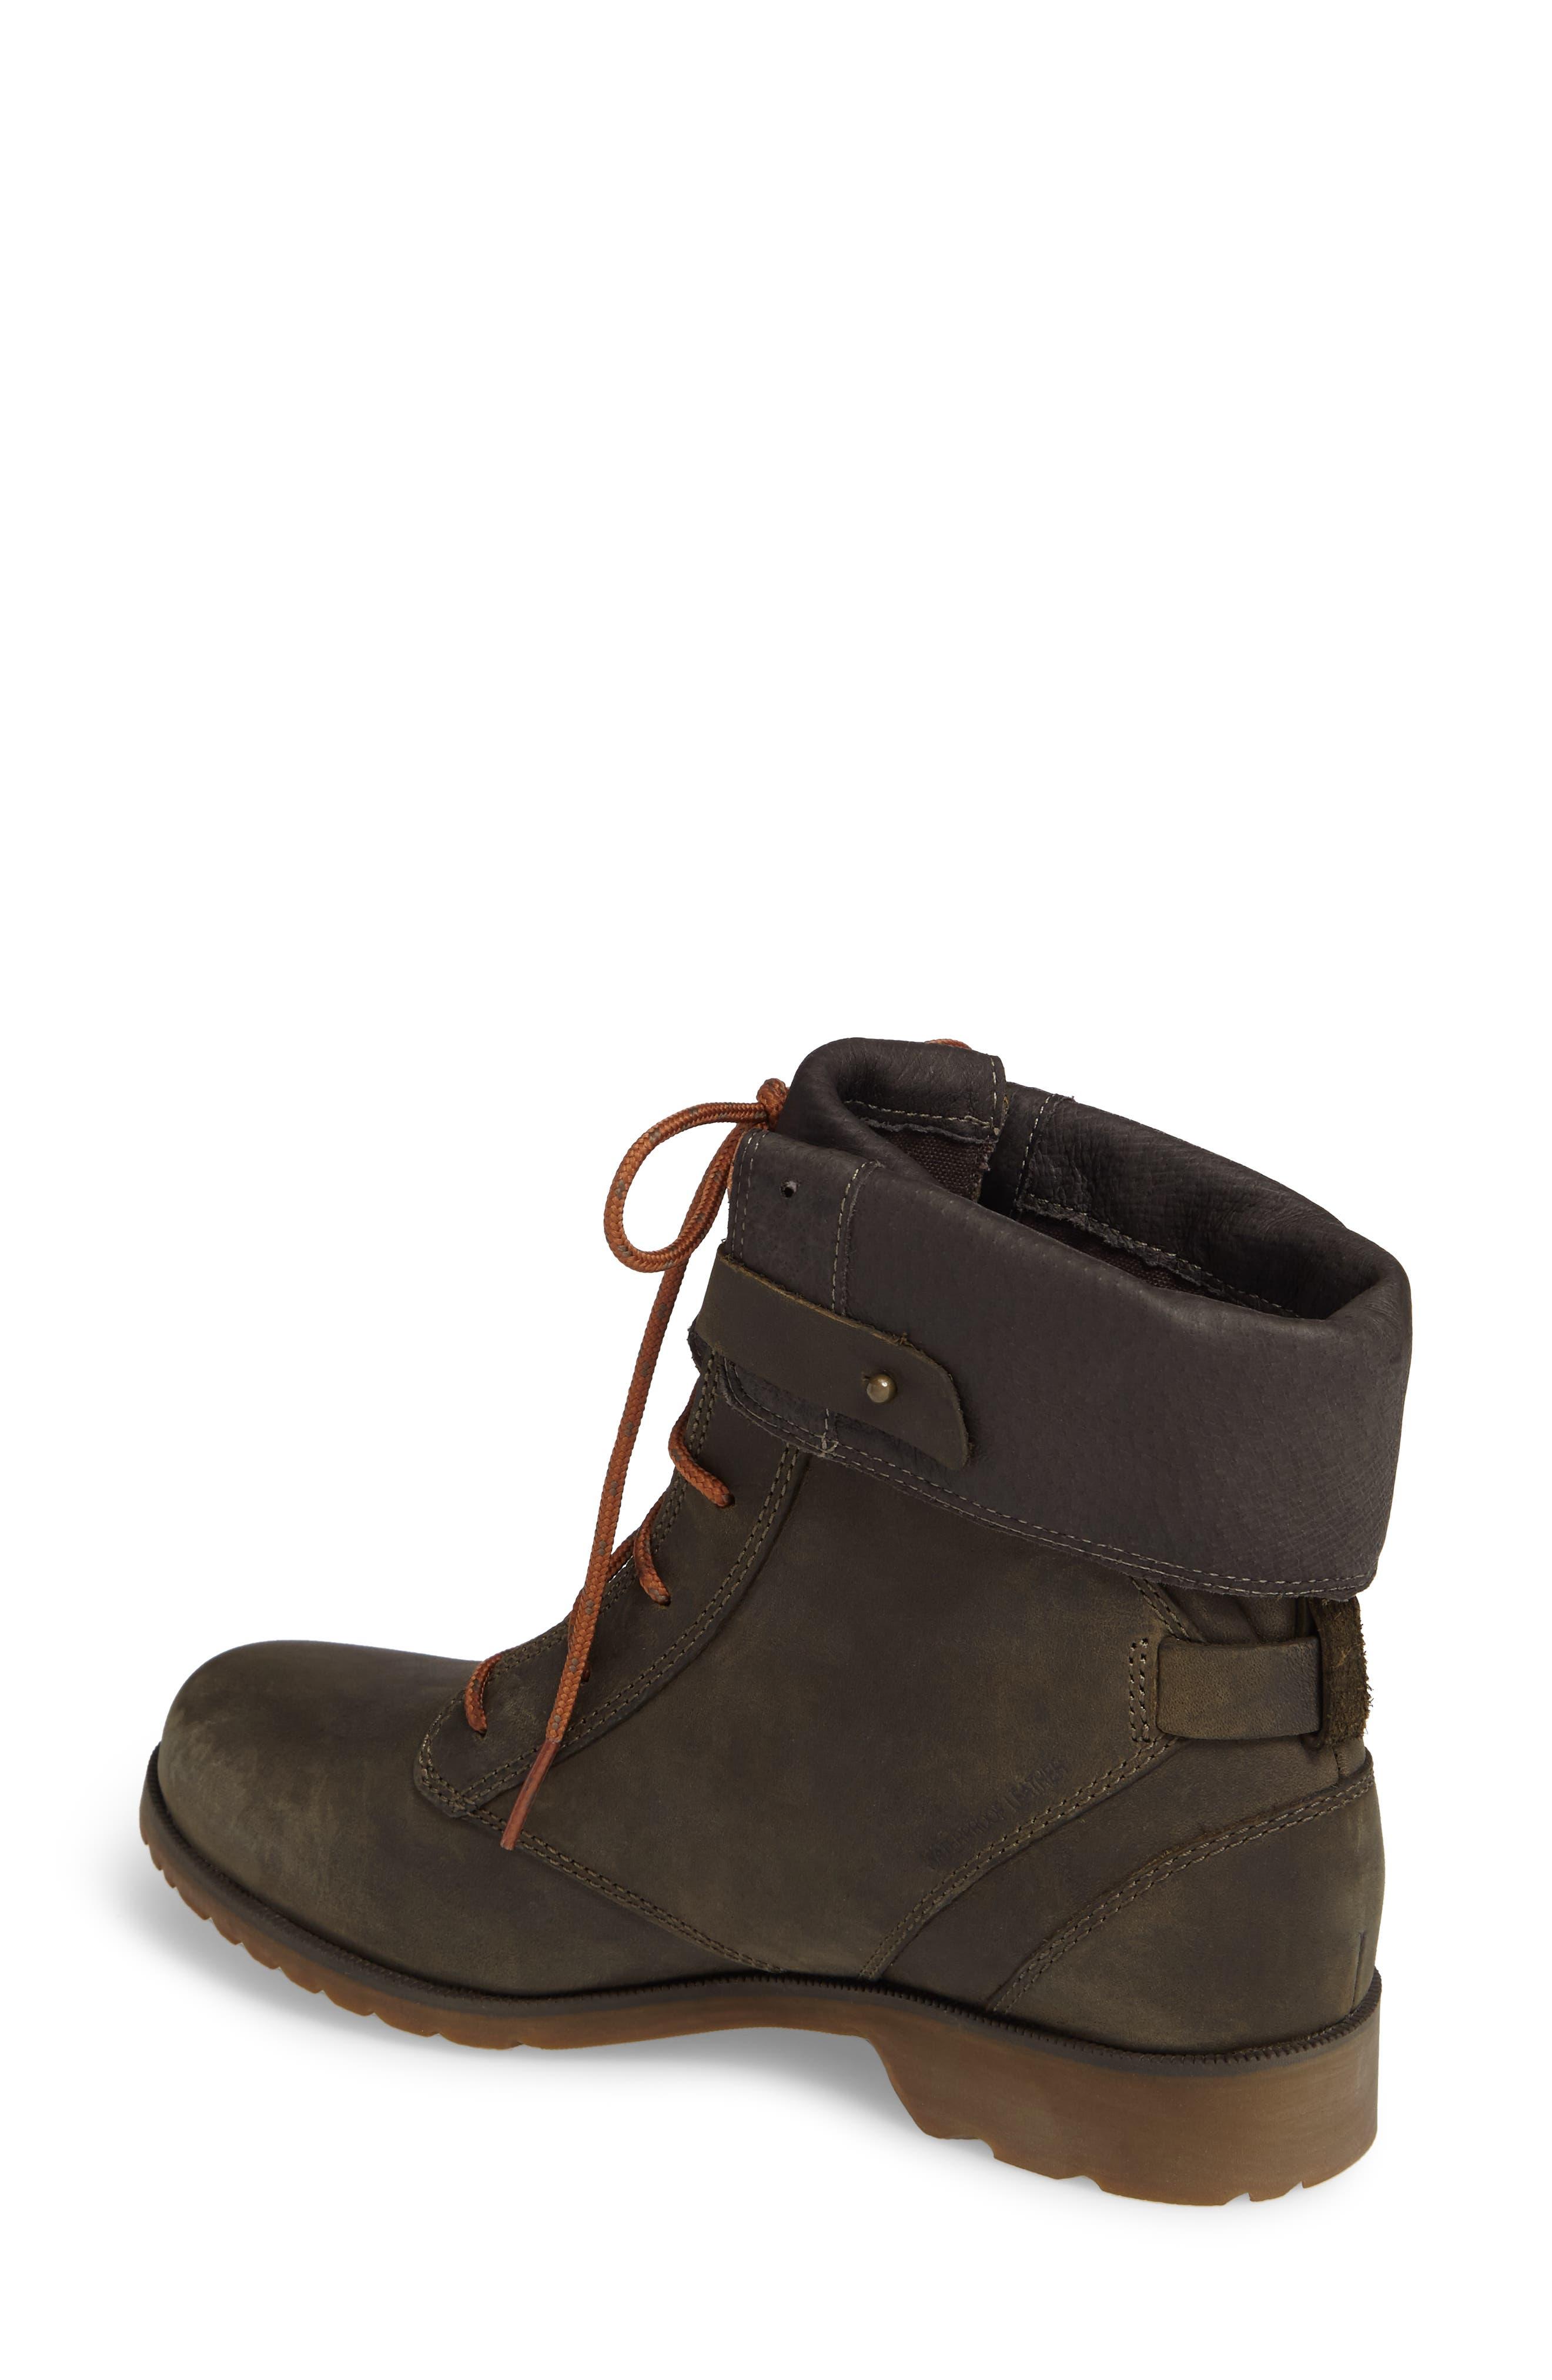 'De La Vina' Waterproof Lace-Up Boot,                             Alternate thumbnail 2, color,                             Dark Olive Leather